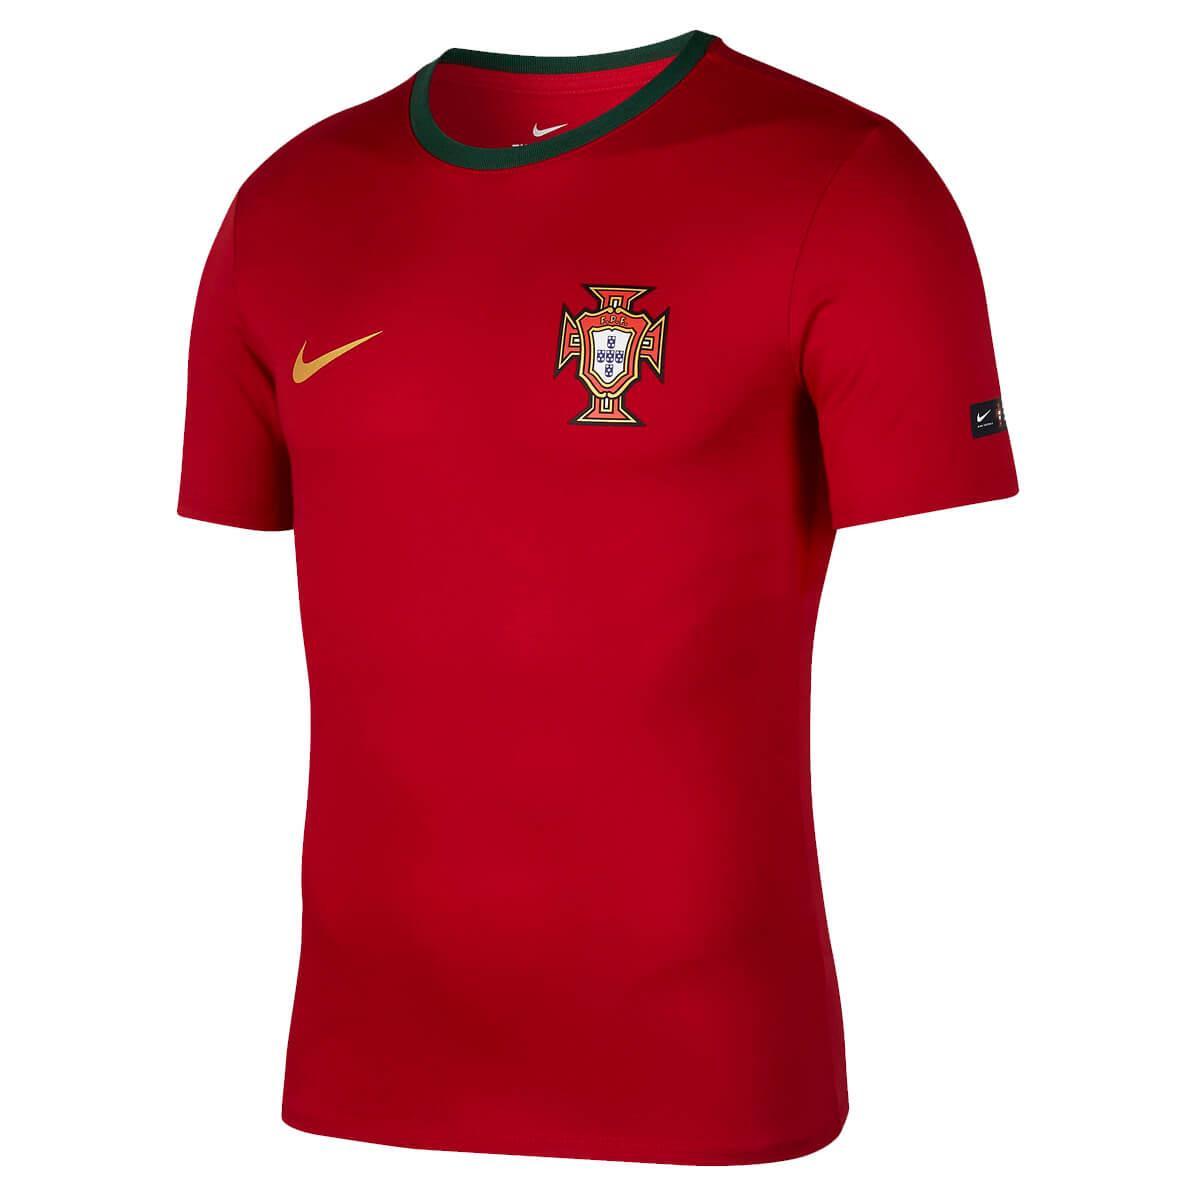 2030a6ec0 Camiseta Nike Portugal 2018 19 Crest Masculina